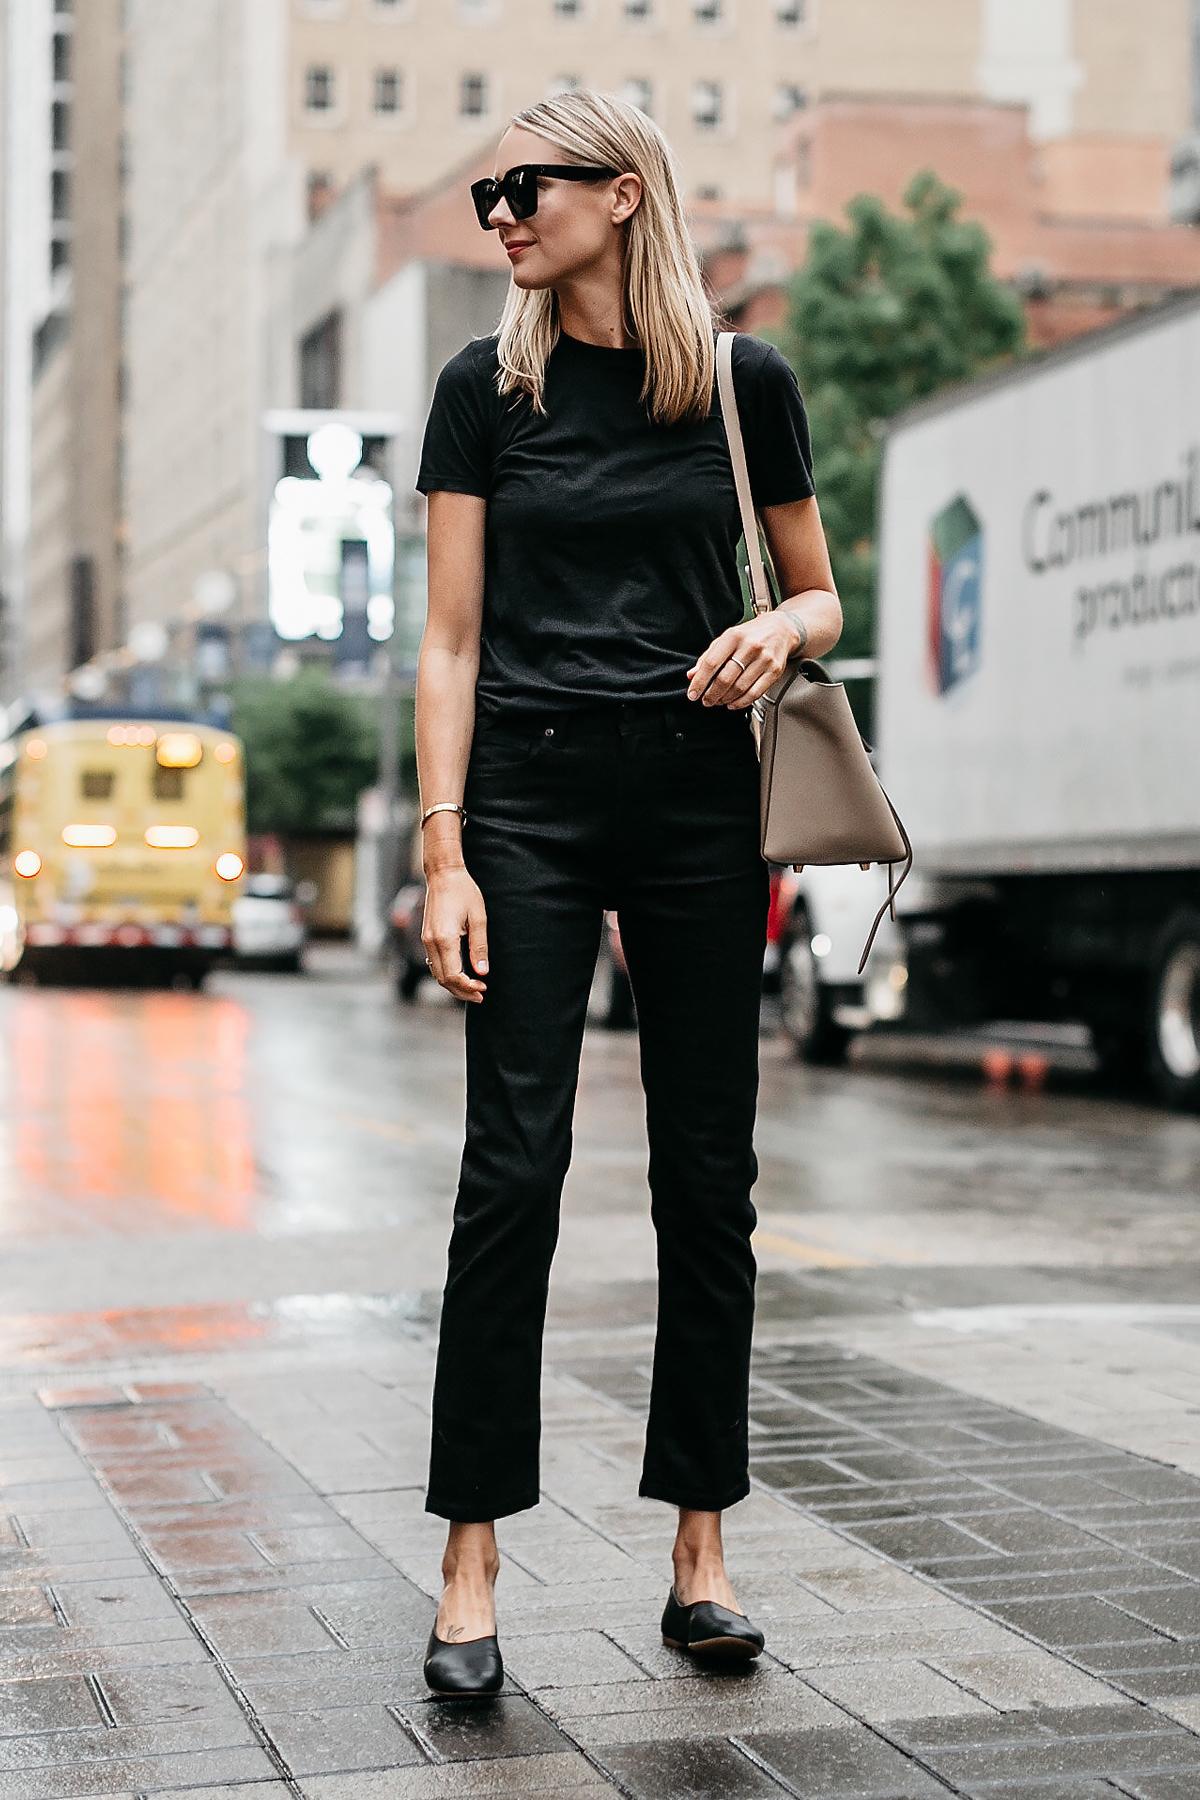 Blonde Woman Wearing Everlane Black Tshirt Everlane Black Boyfriend Jeans Everlane Black Day Glove Flats Fashion Jackson Dallas Blogger Fashion Blogger Street Style